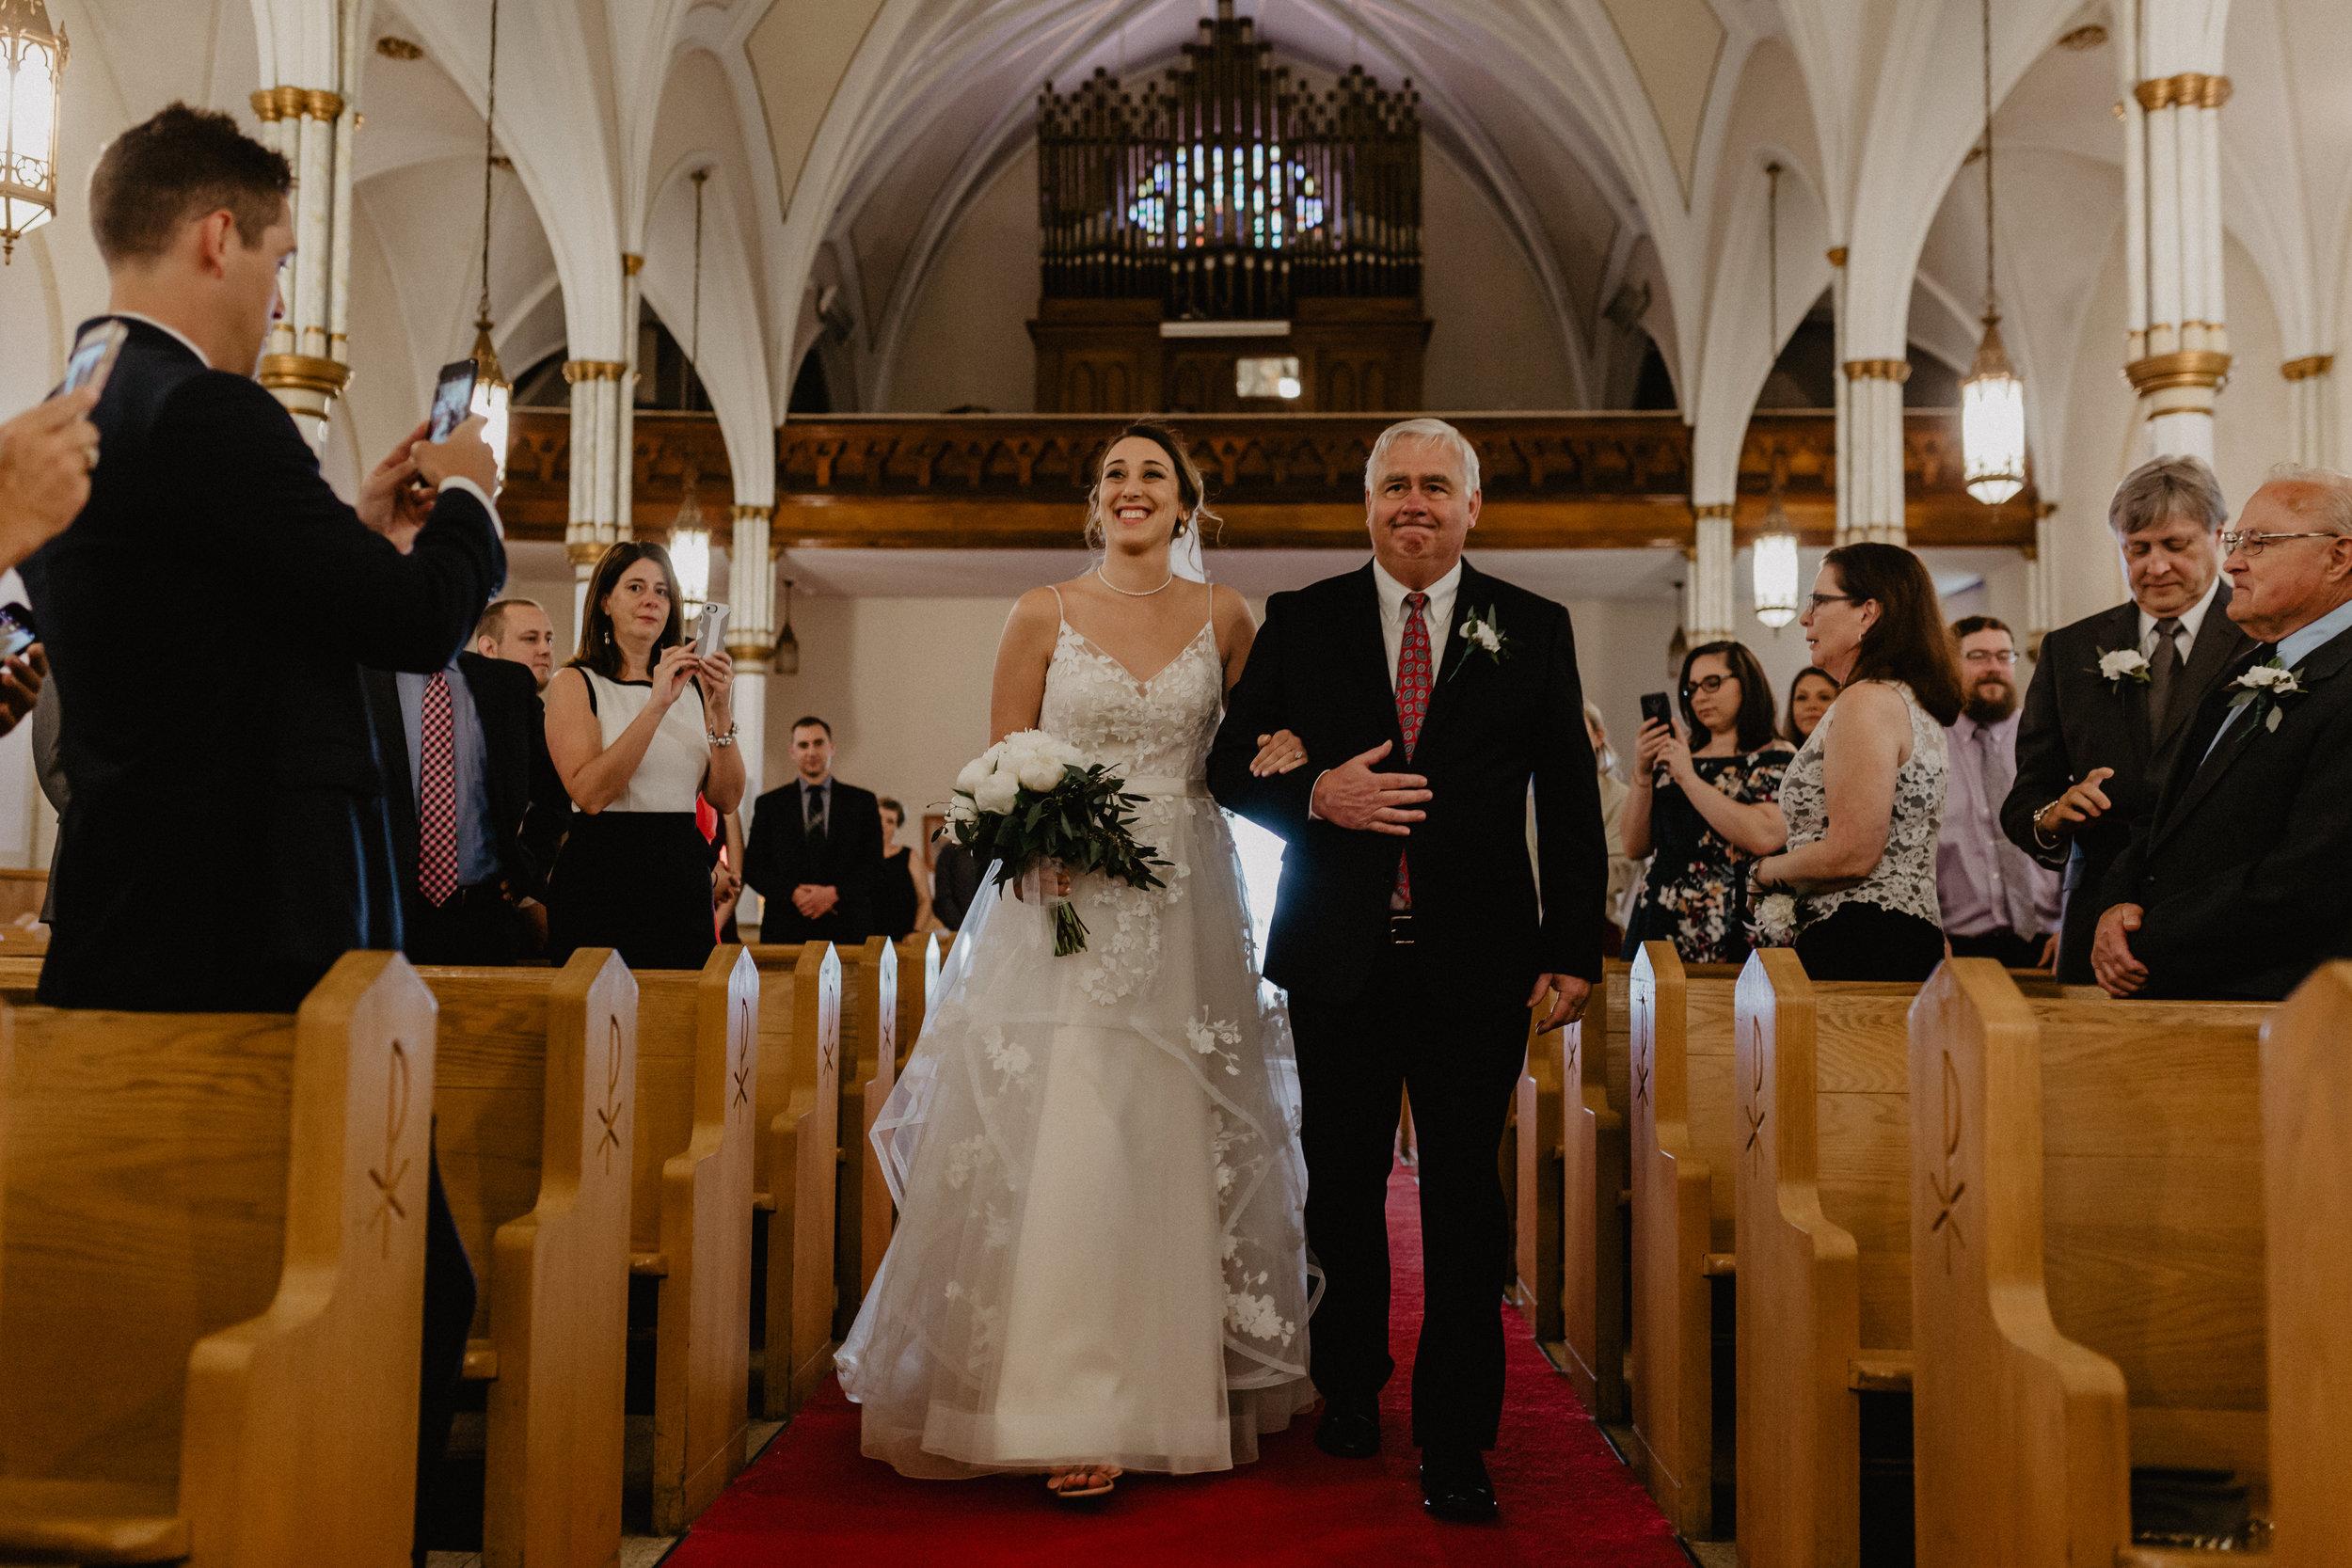 upstate_ny_wedding-22.jpg